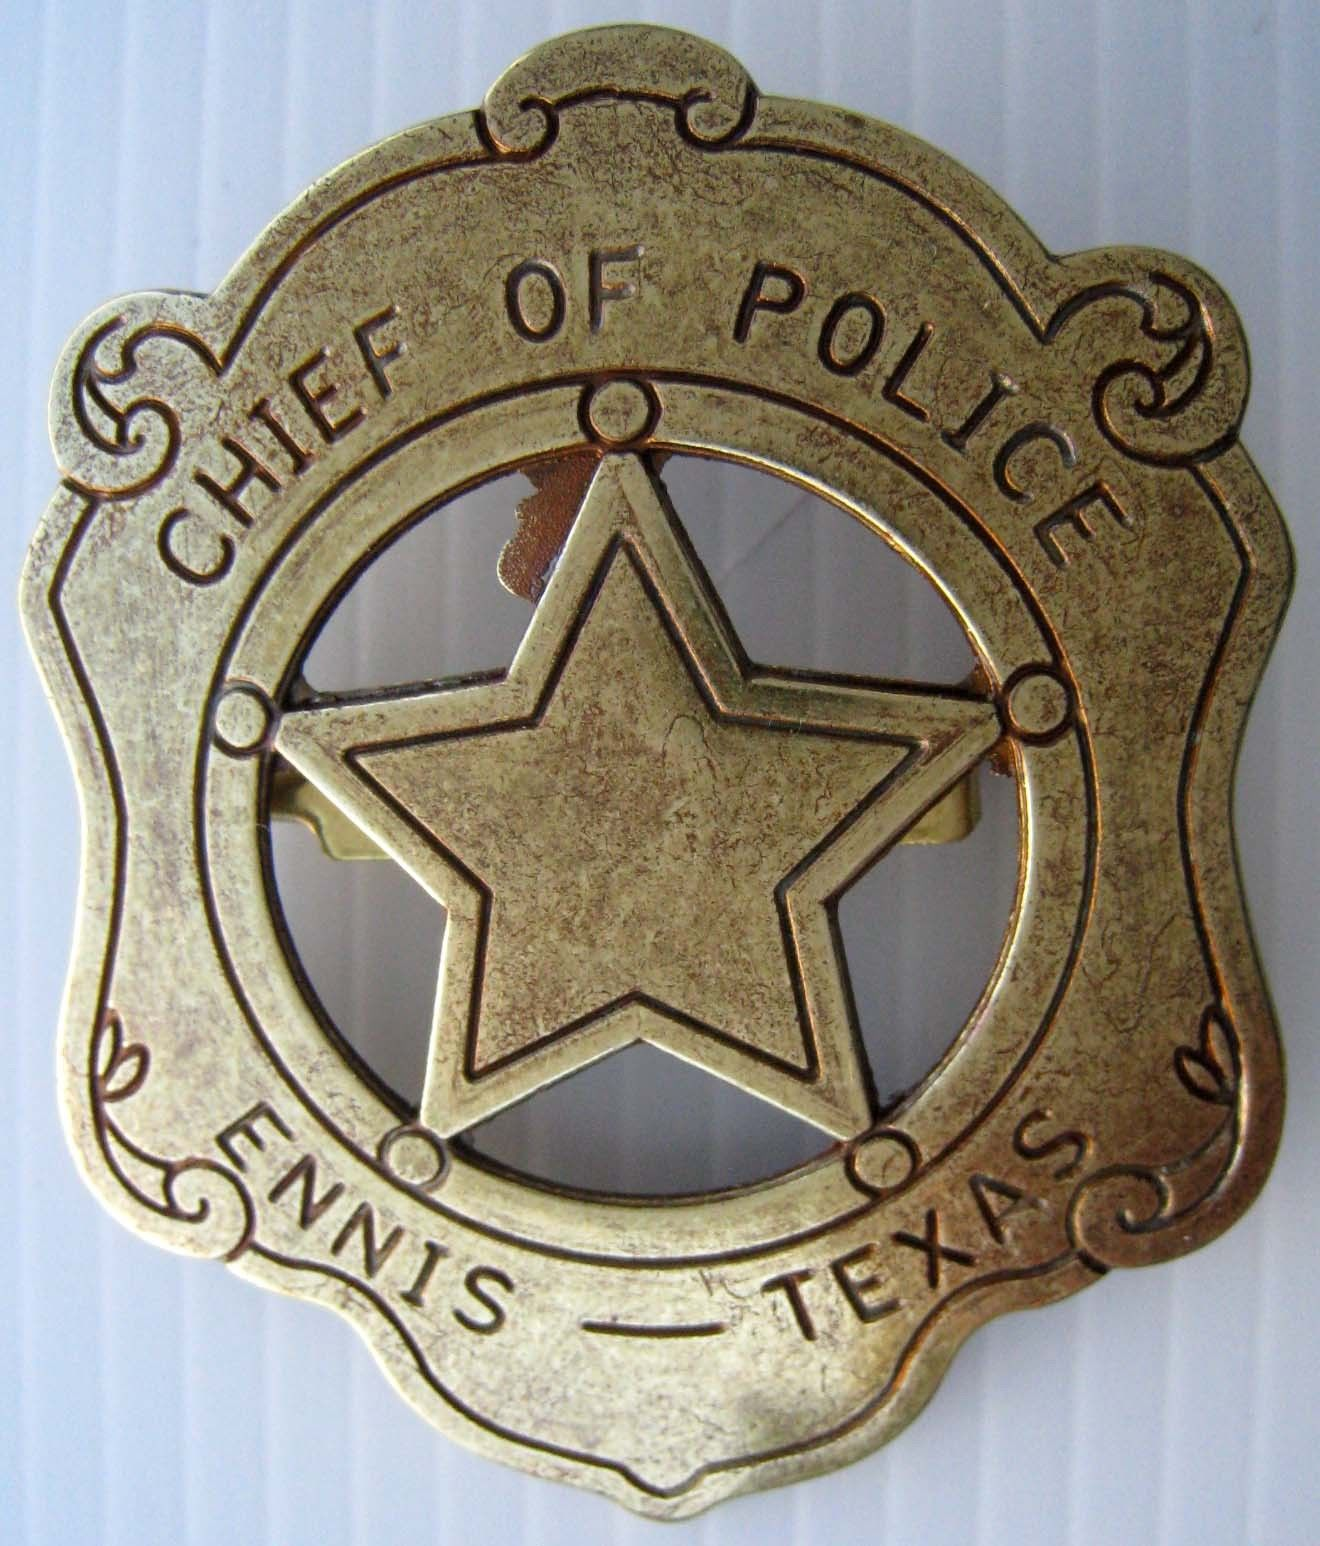 C de police dx